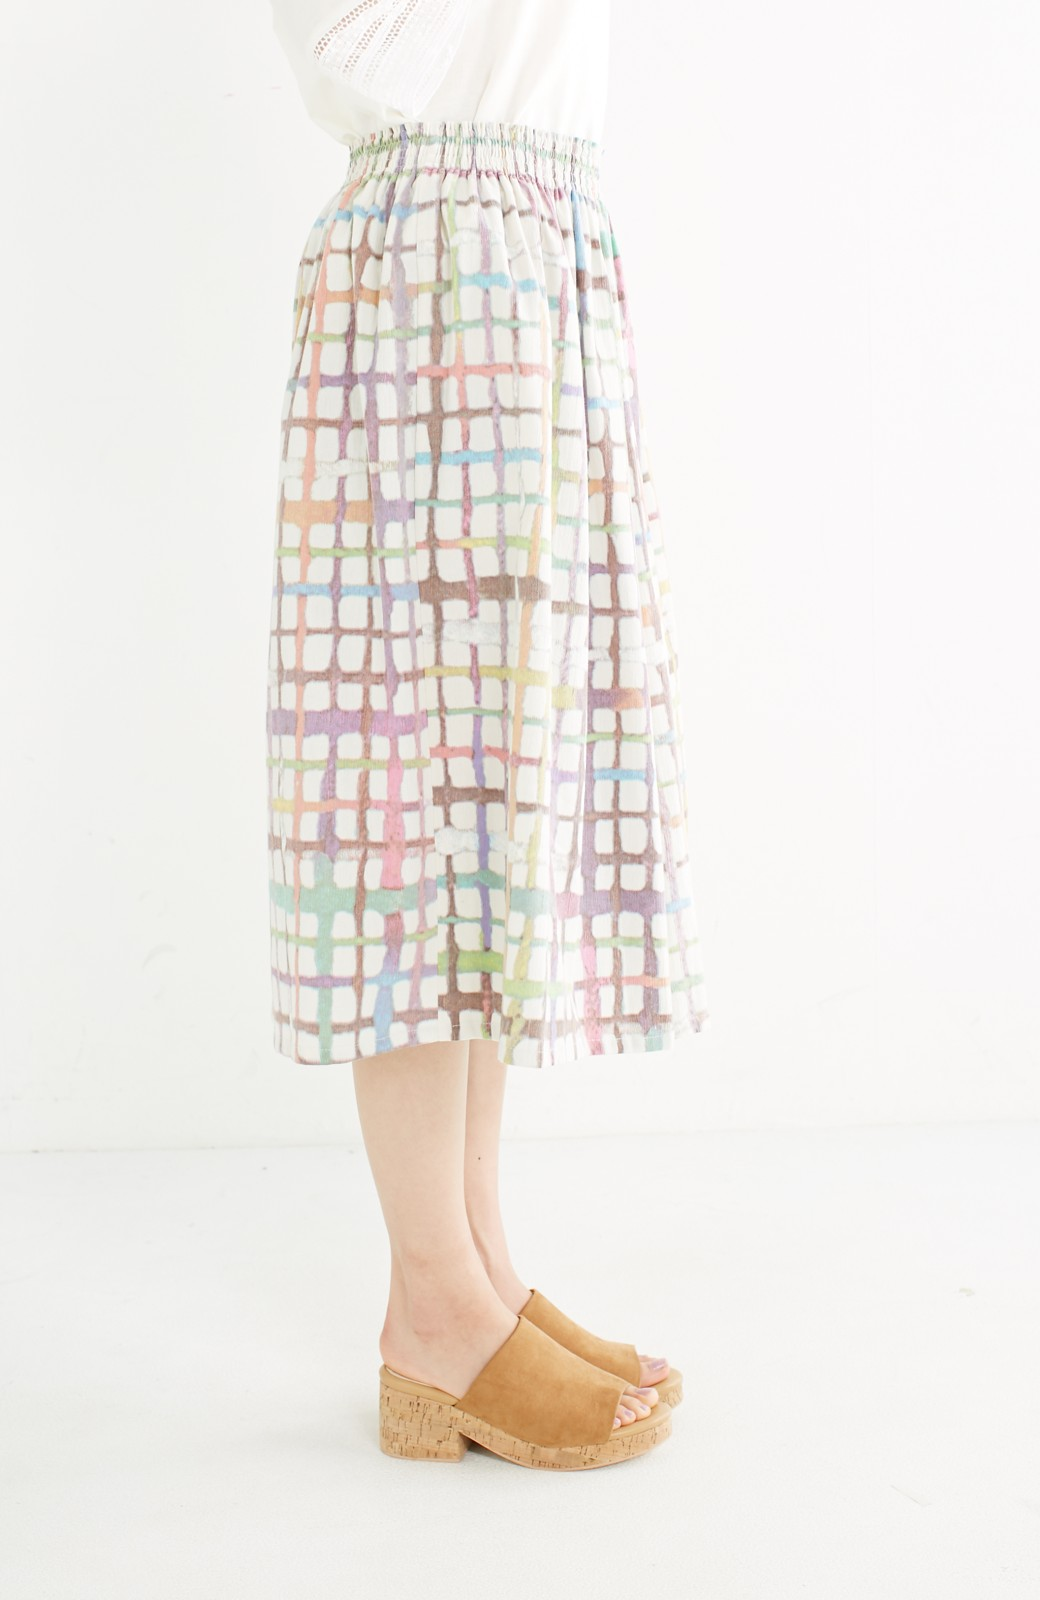 haco! 京都の浴衣屋さんと作った浴衣生地のスカート <ベージュ系その他>の商品写真5